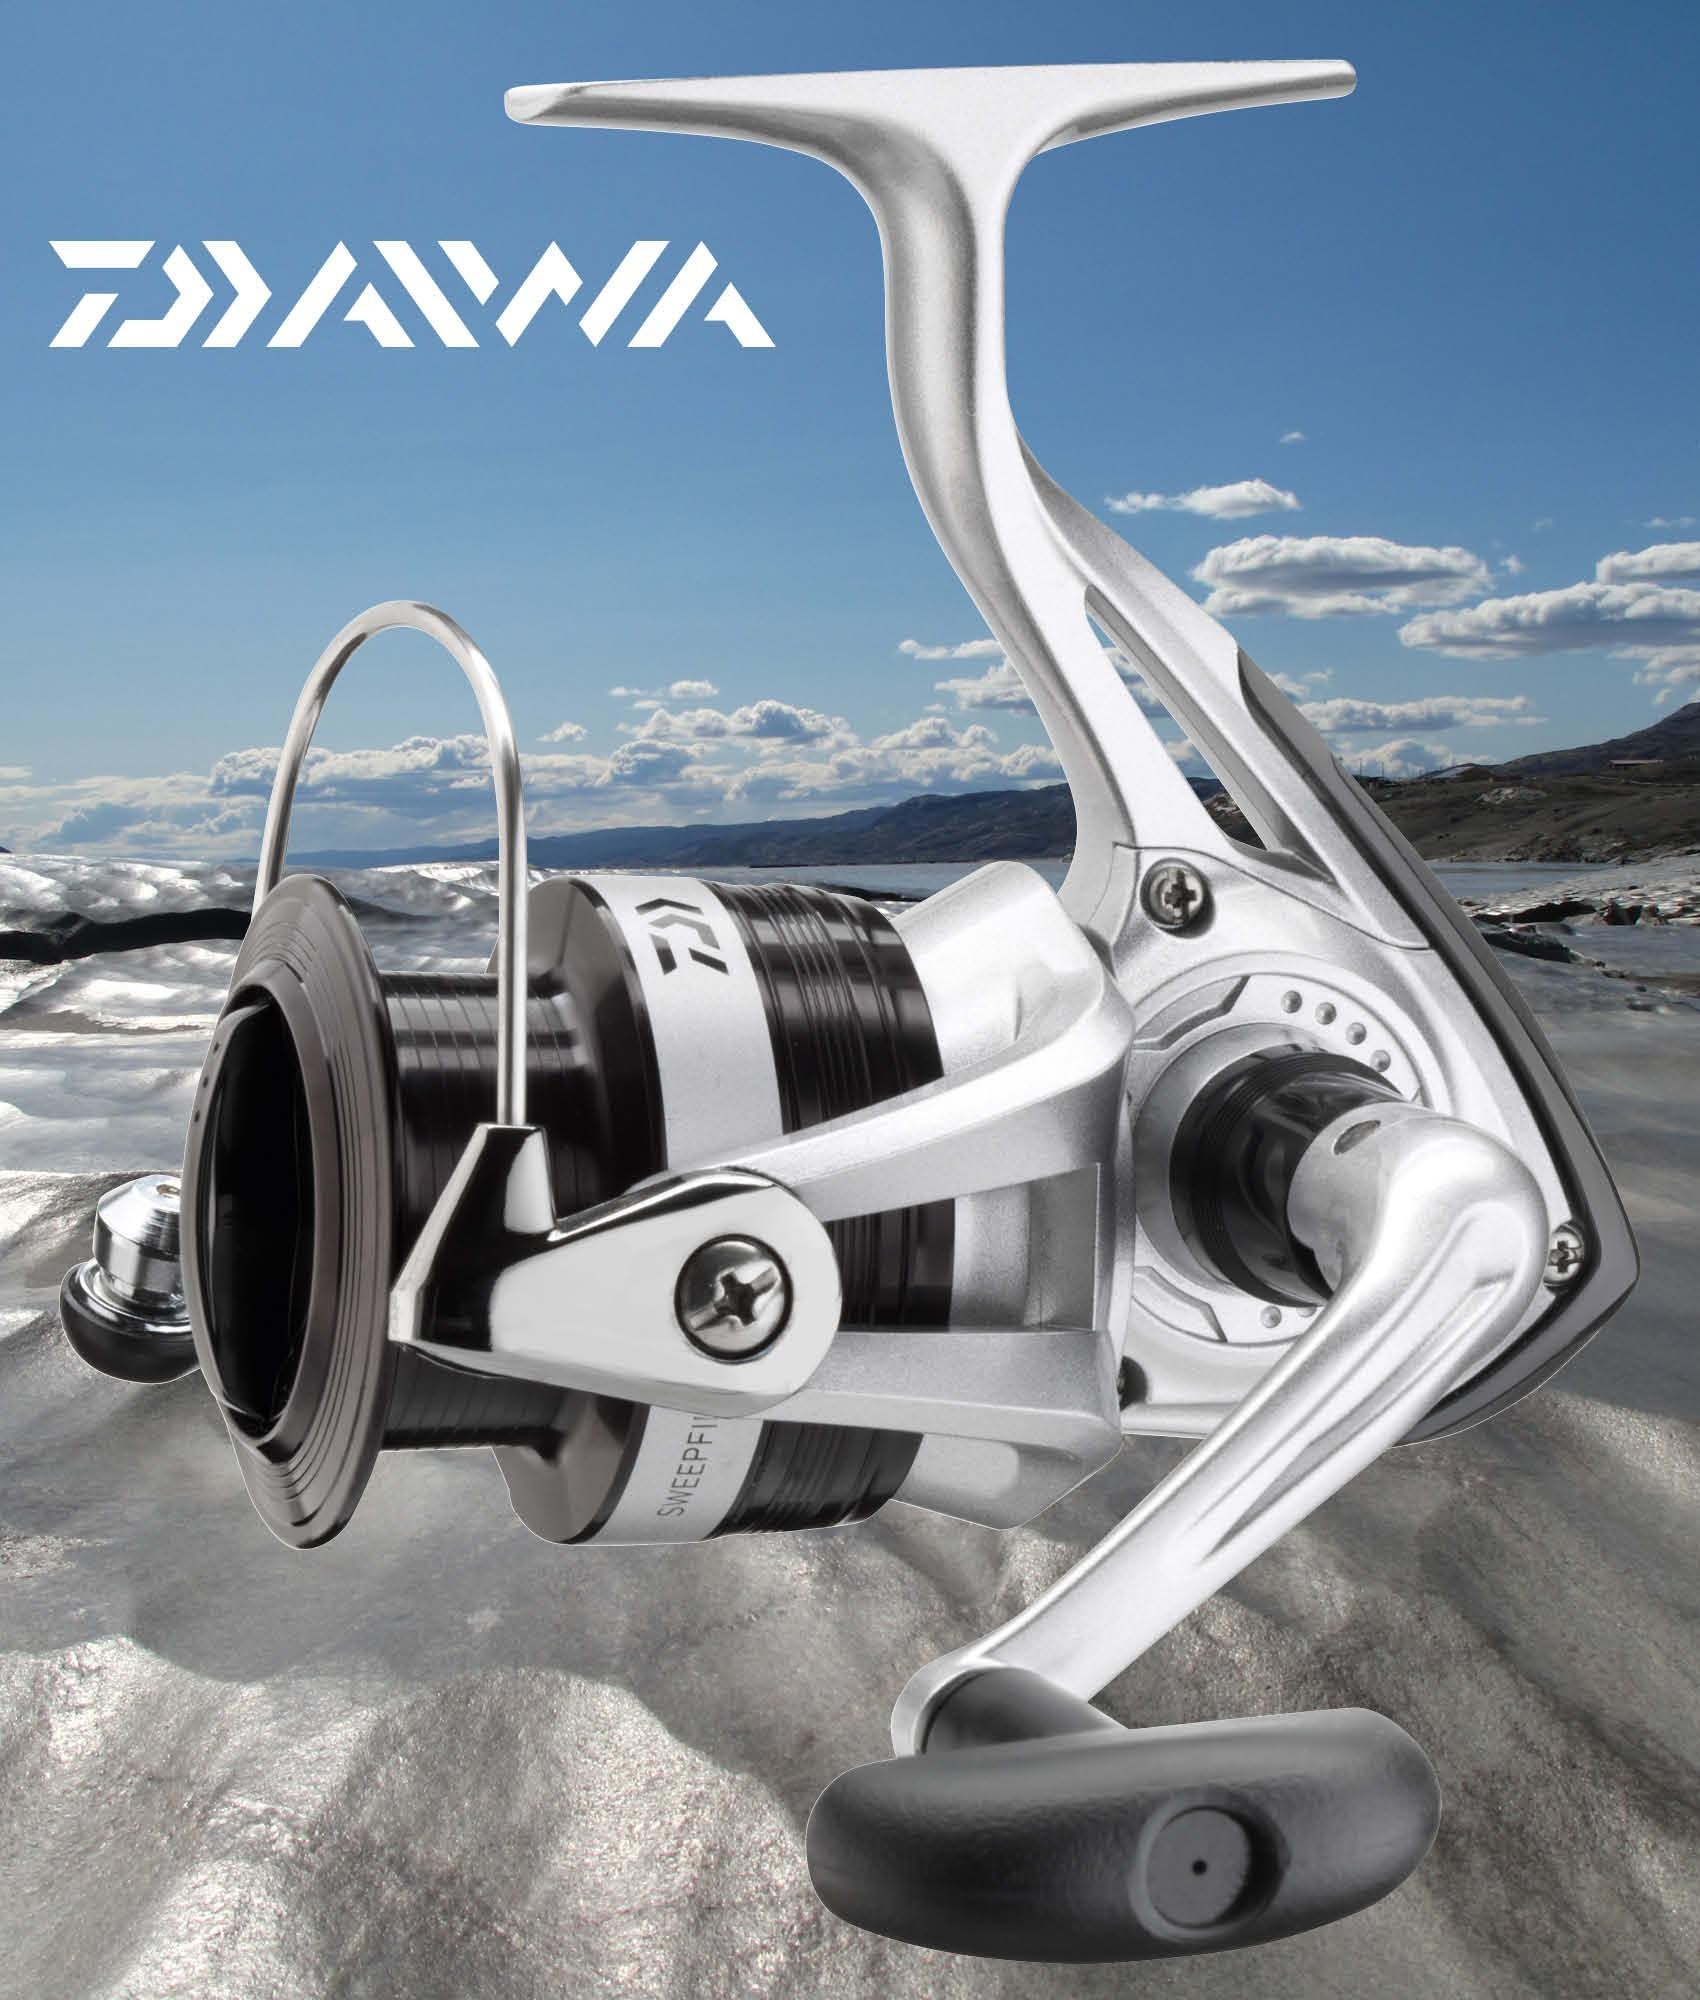 daiwa-sweepfire-ec-modell-2016-10118_3_2_1_1